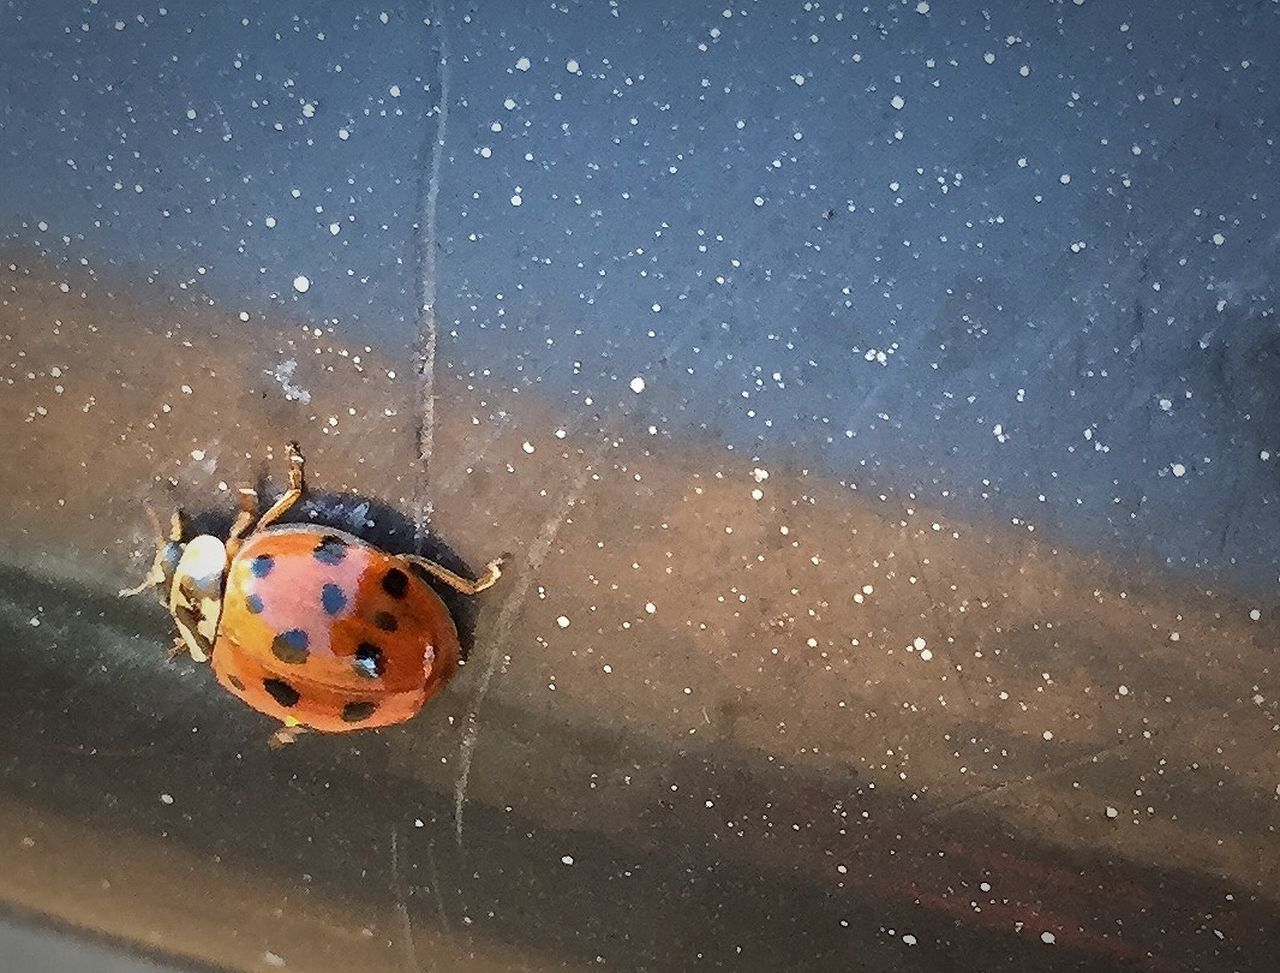 Nyckelpiga Ladybug October Sweden